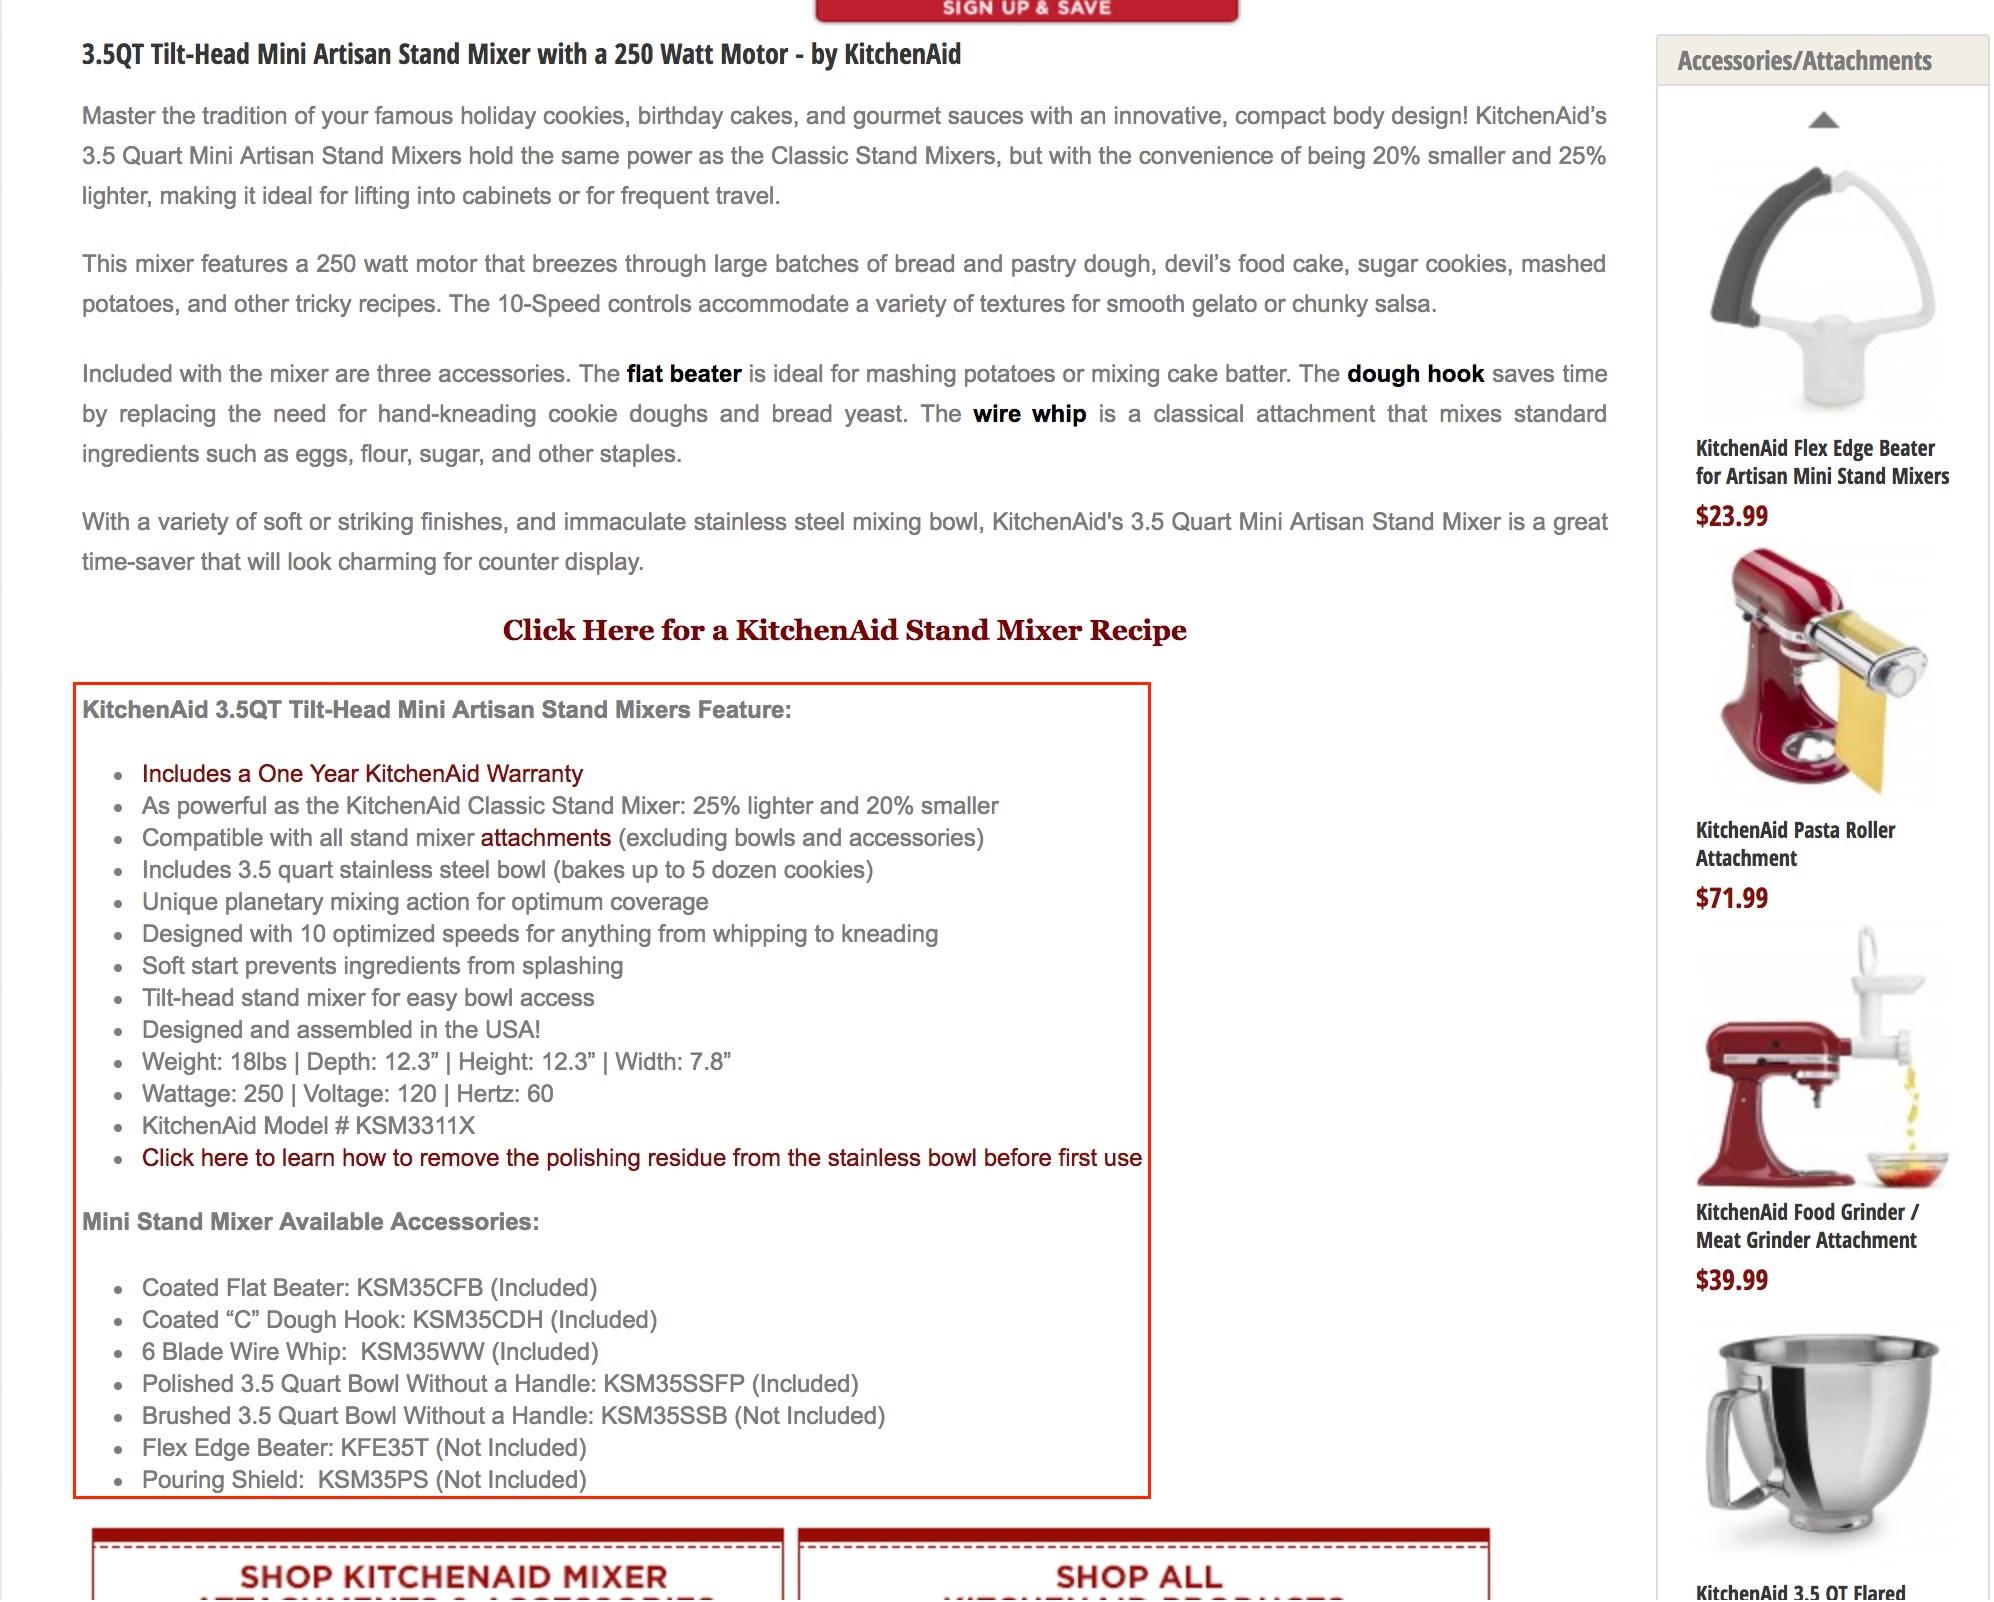 Screenshot showing an ecommerce product description